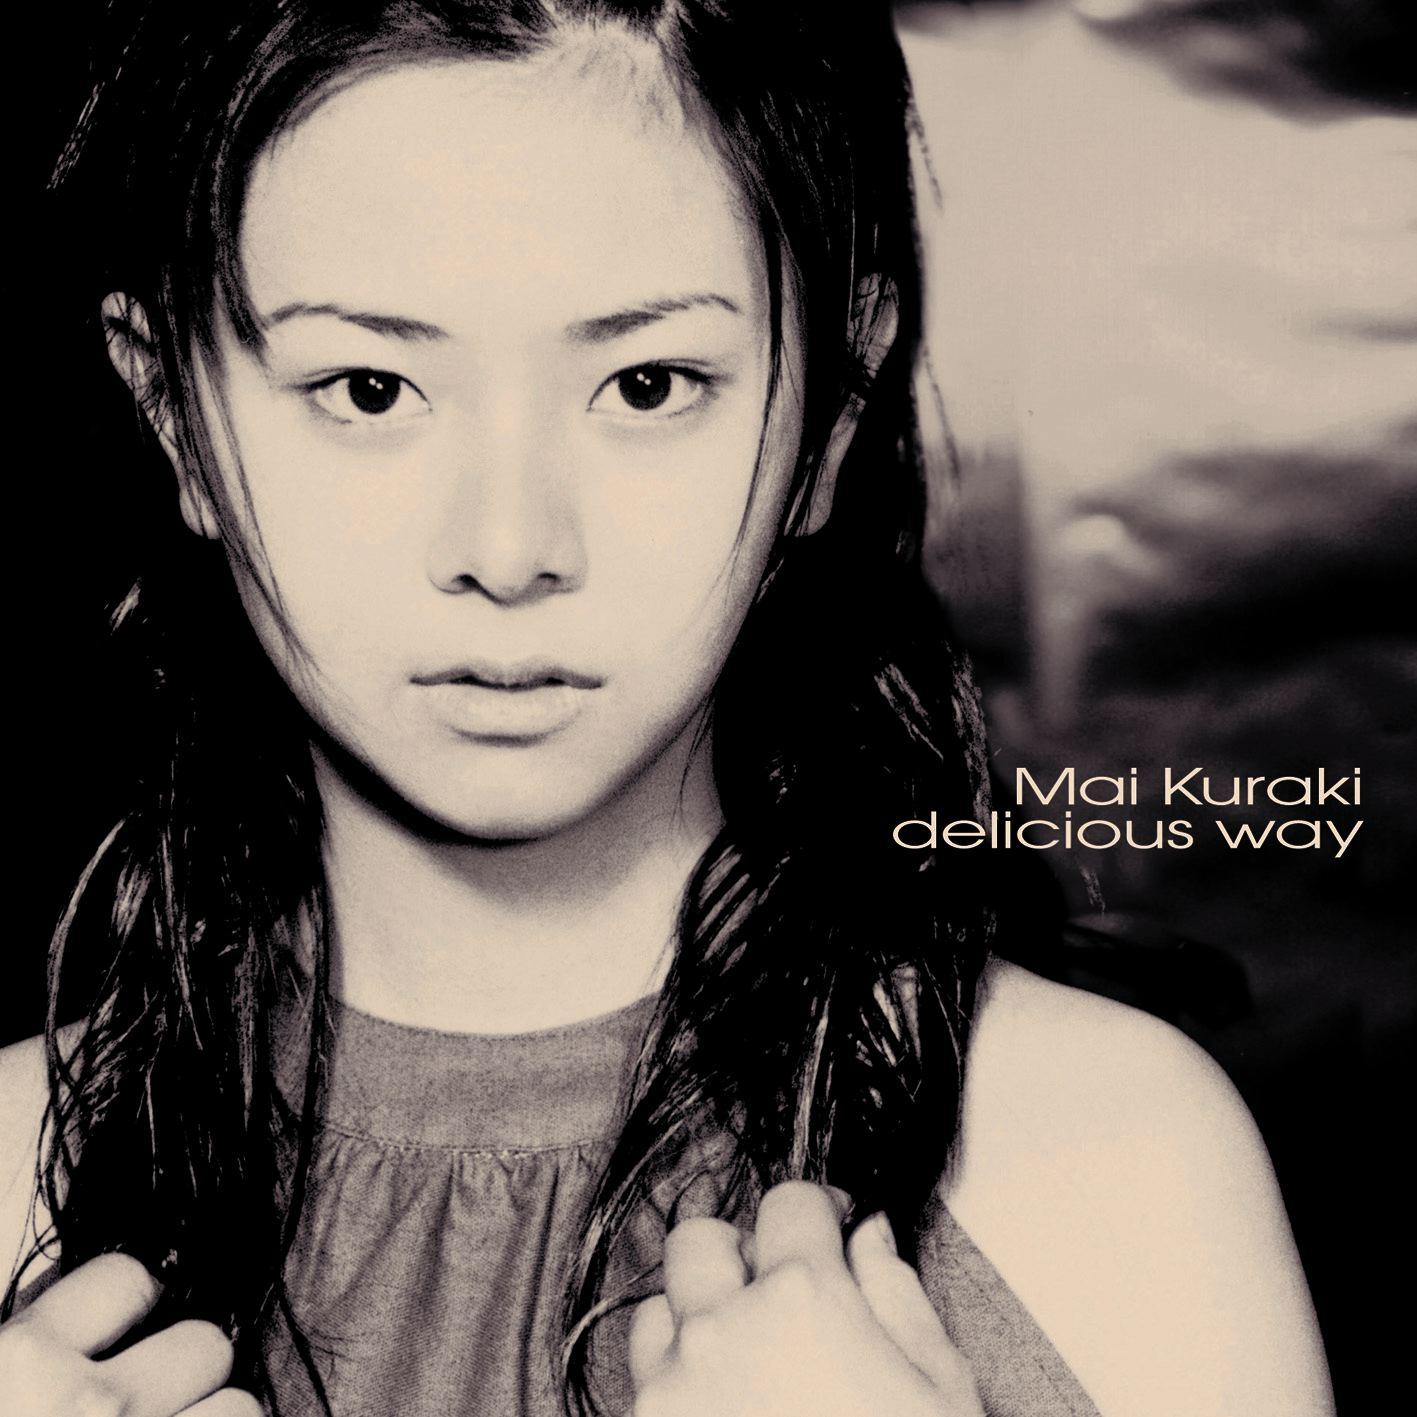 20160930.11.09 Mai Kuraki - Delicious Way (2000) cover.jpg